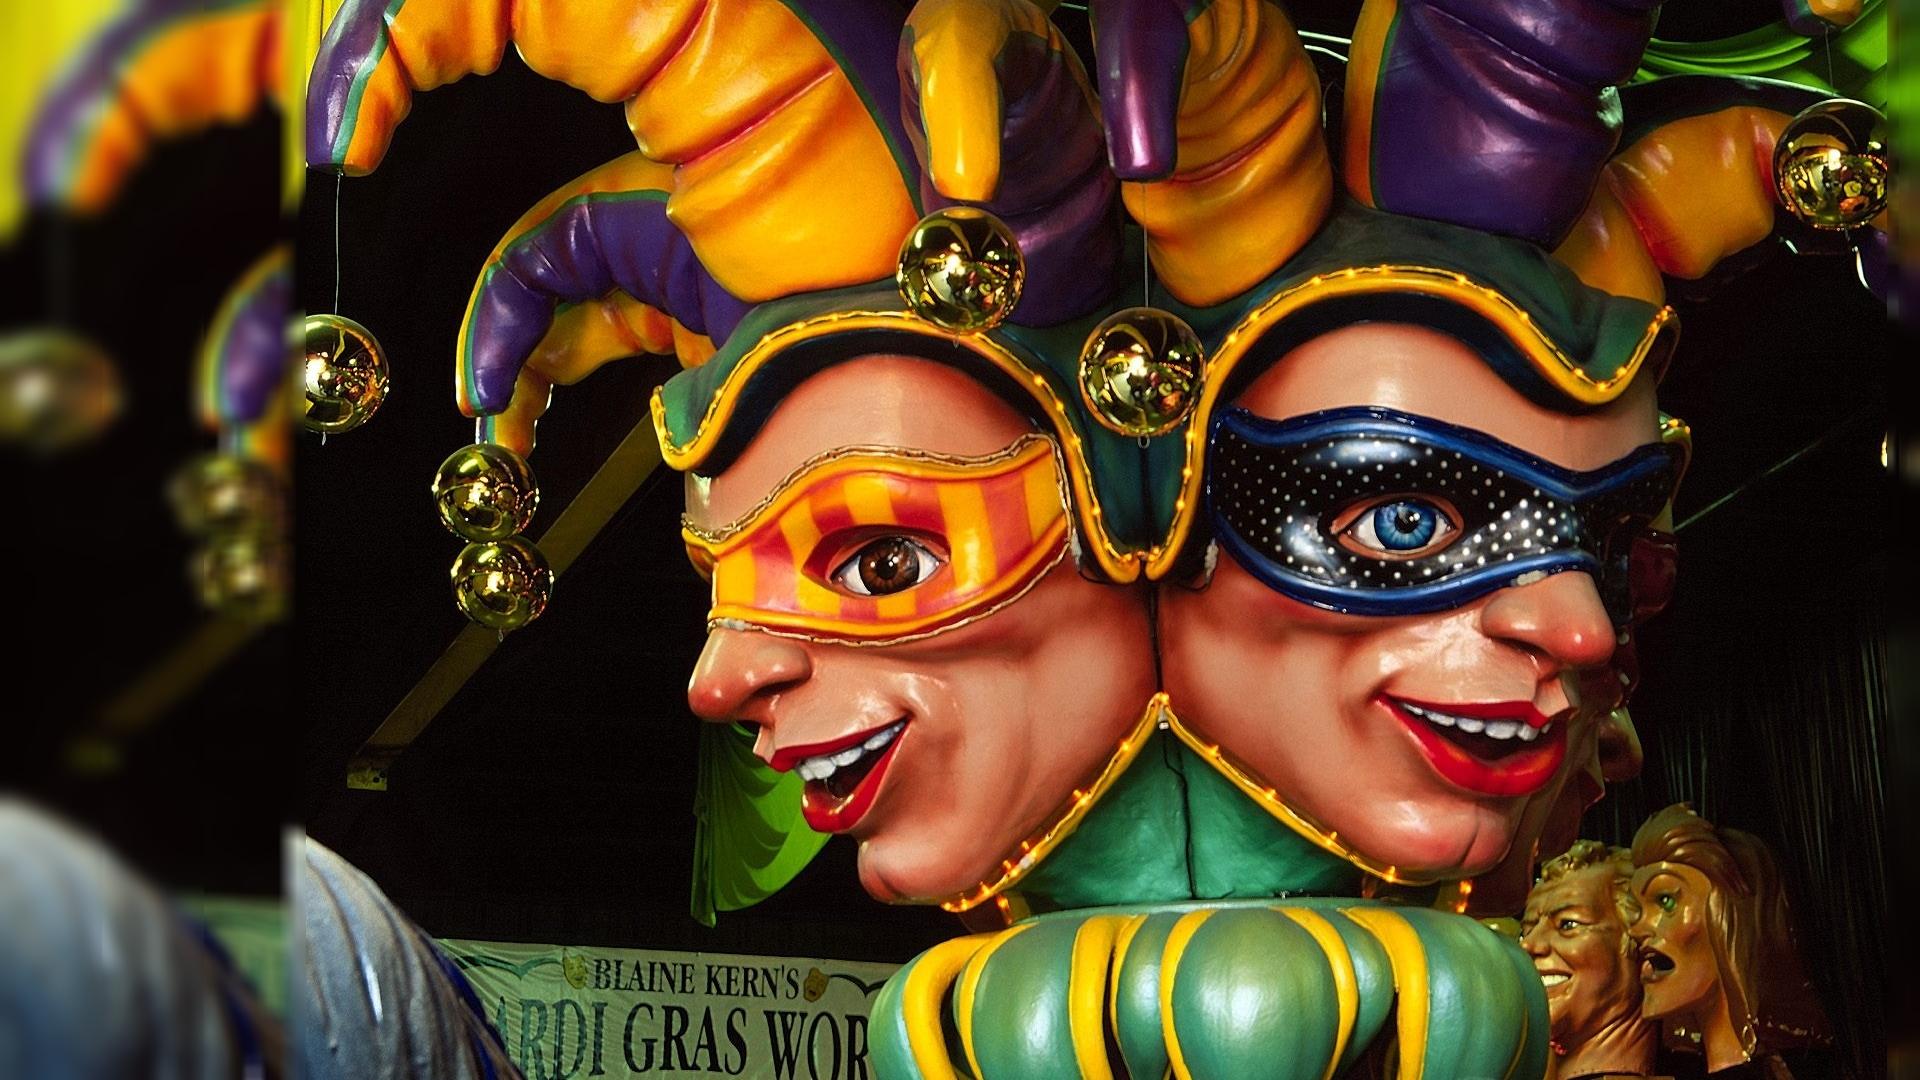 [50+] Free Funny Mardi Gras Wallpapers On WallpaperSafari